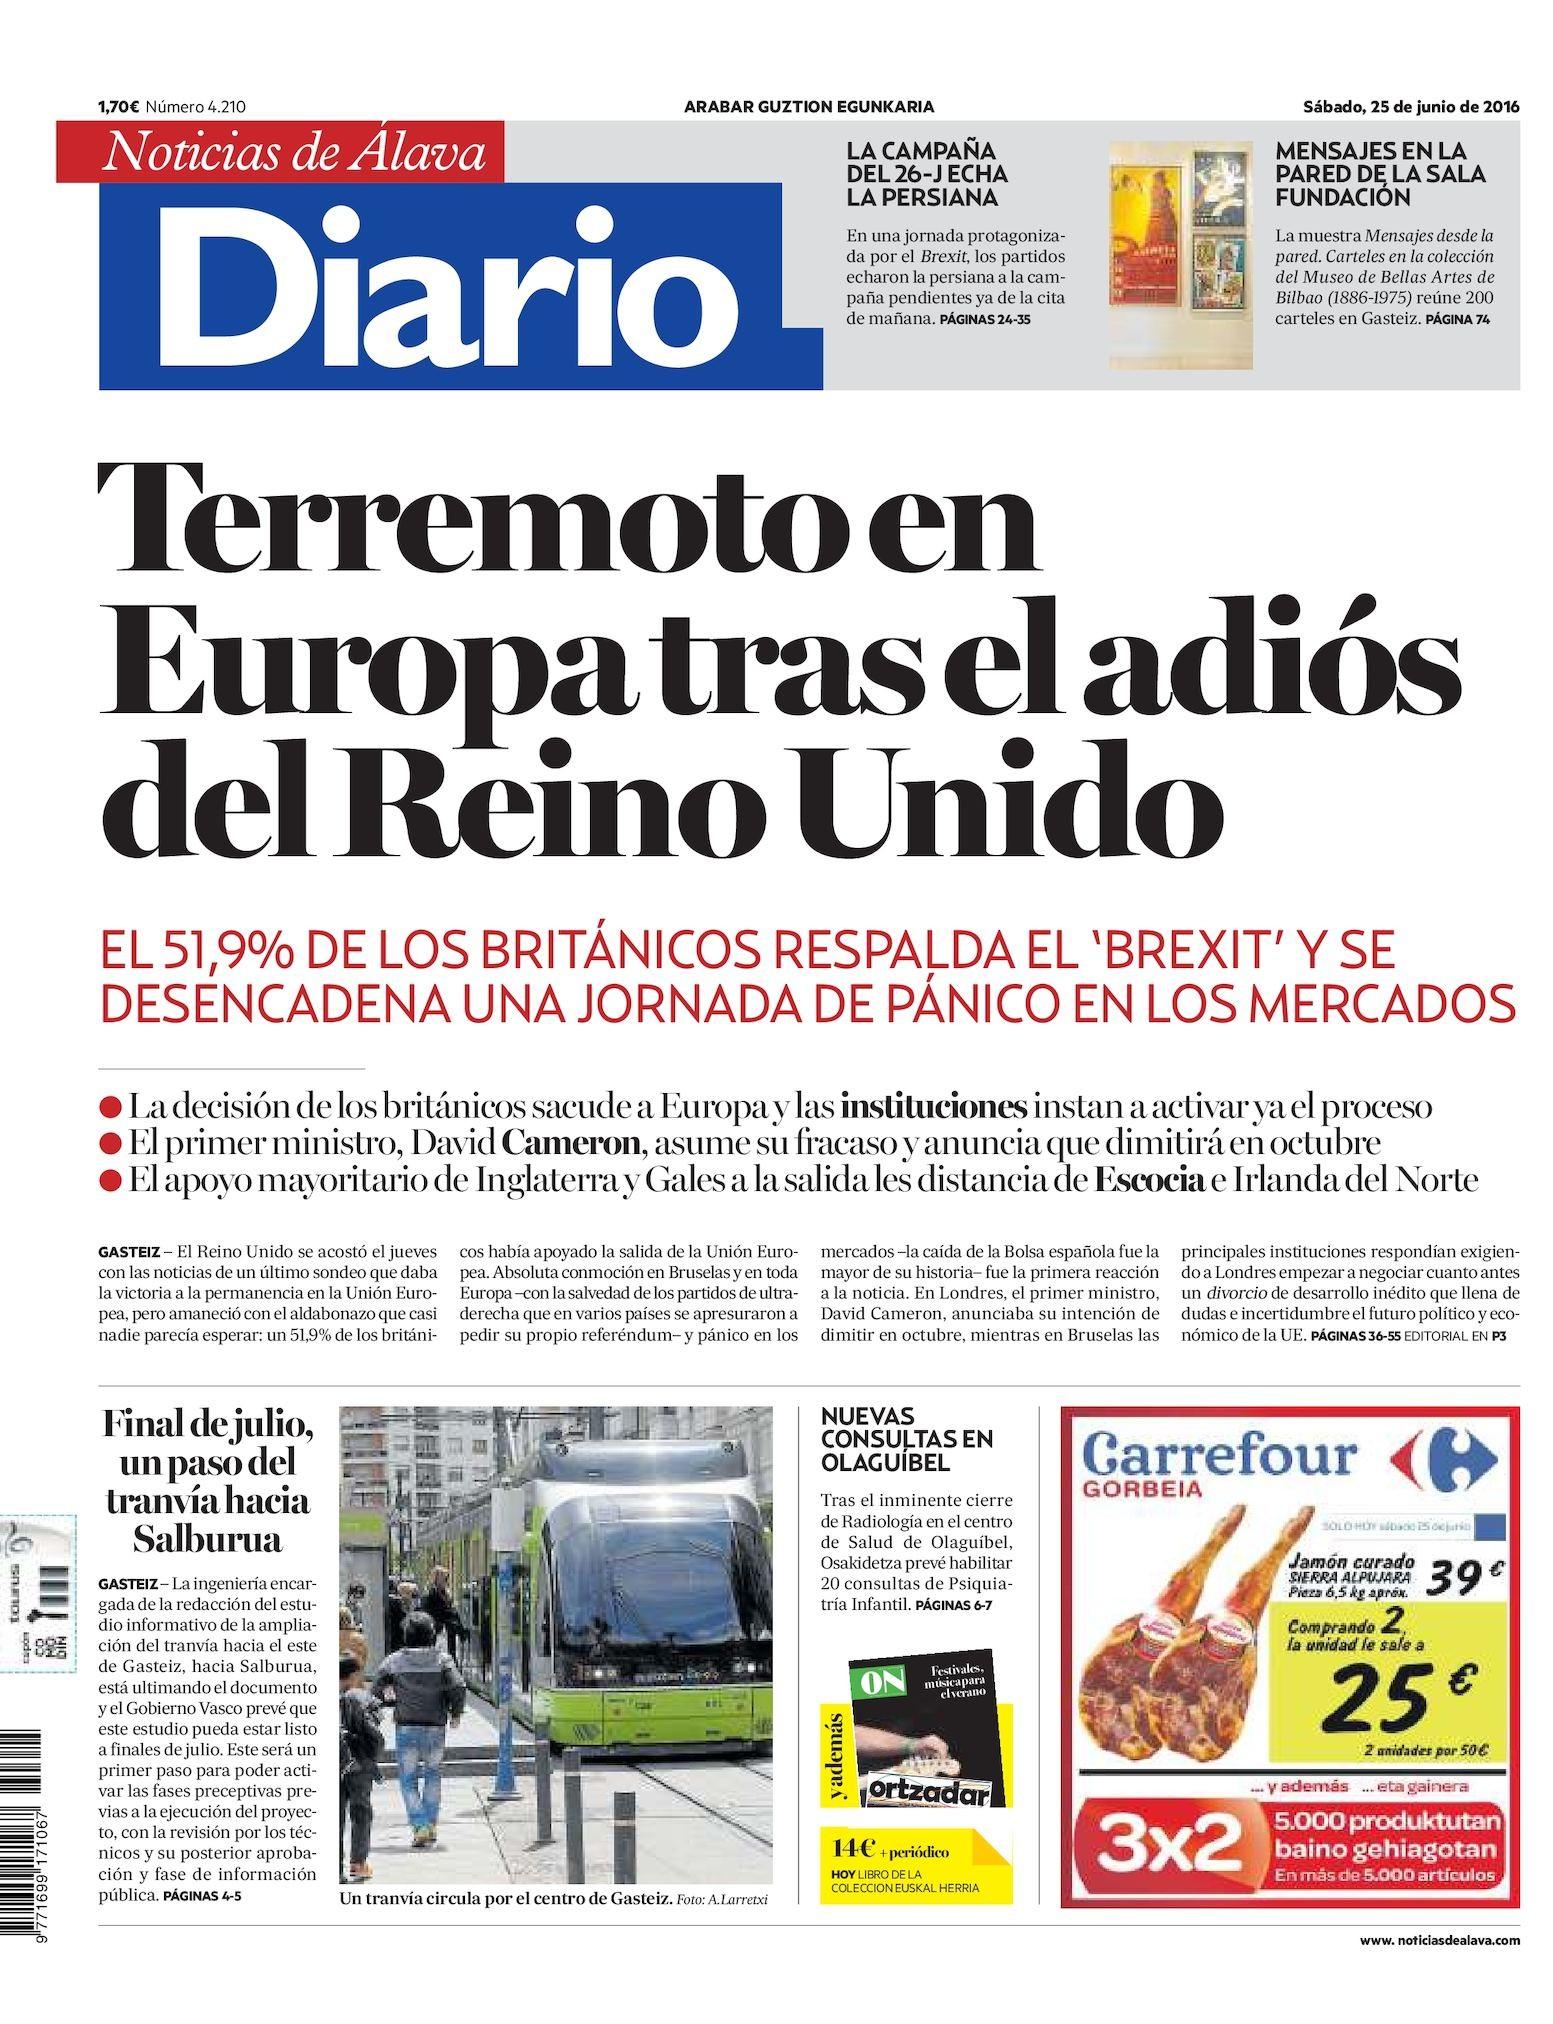 Calendario 2019 Semana Santa Peru Más Caliente Calaméo Diario De Noticias De lava